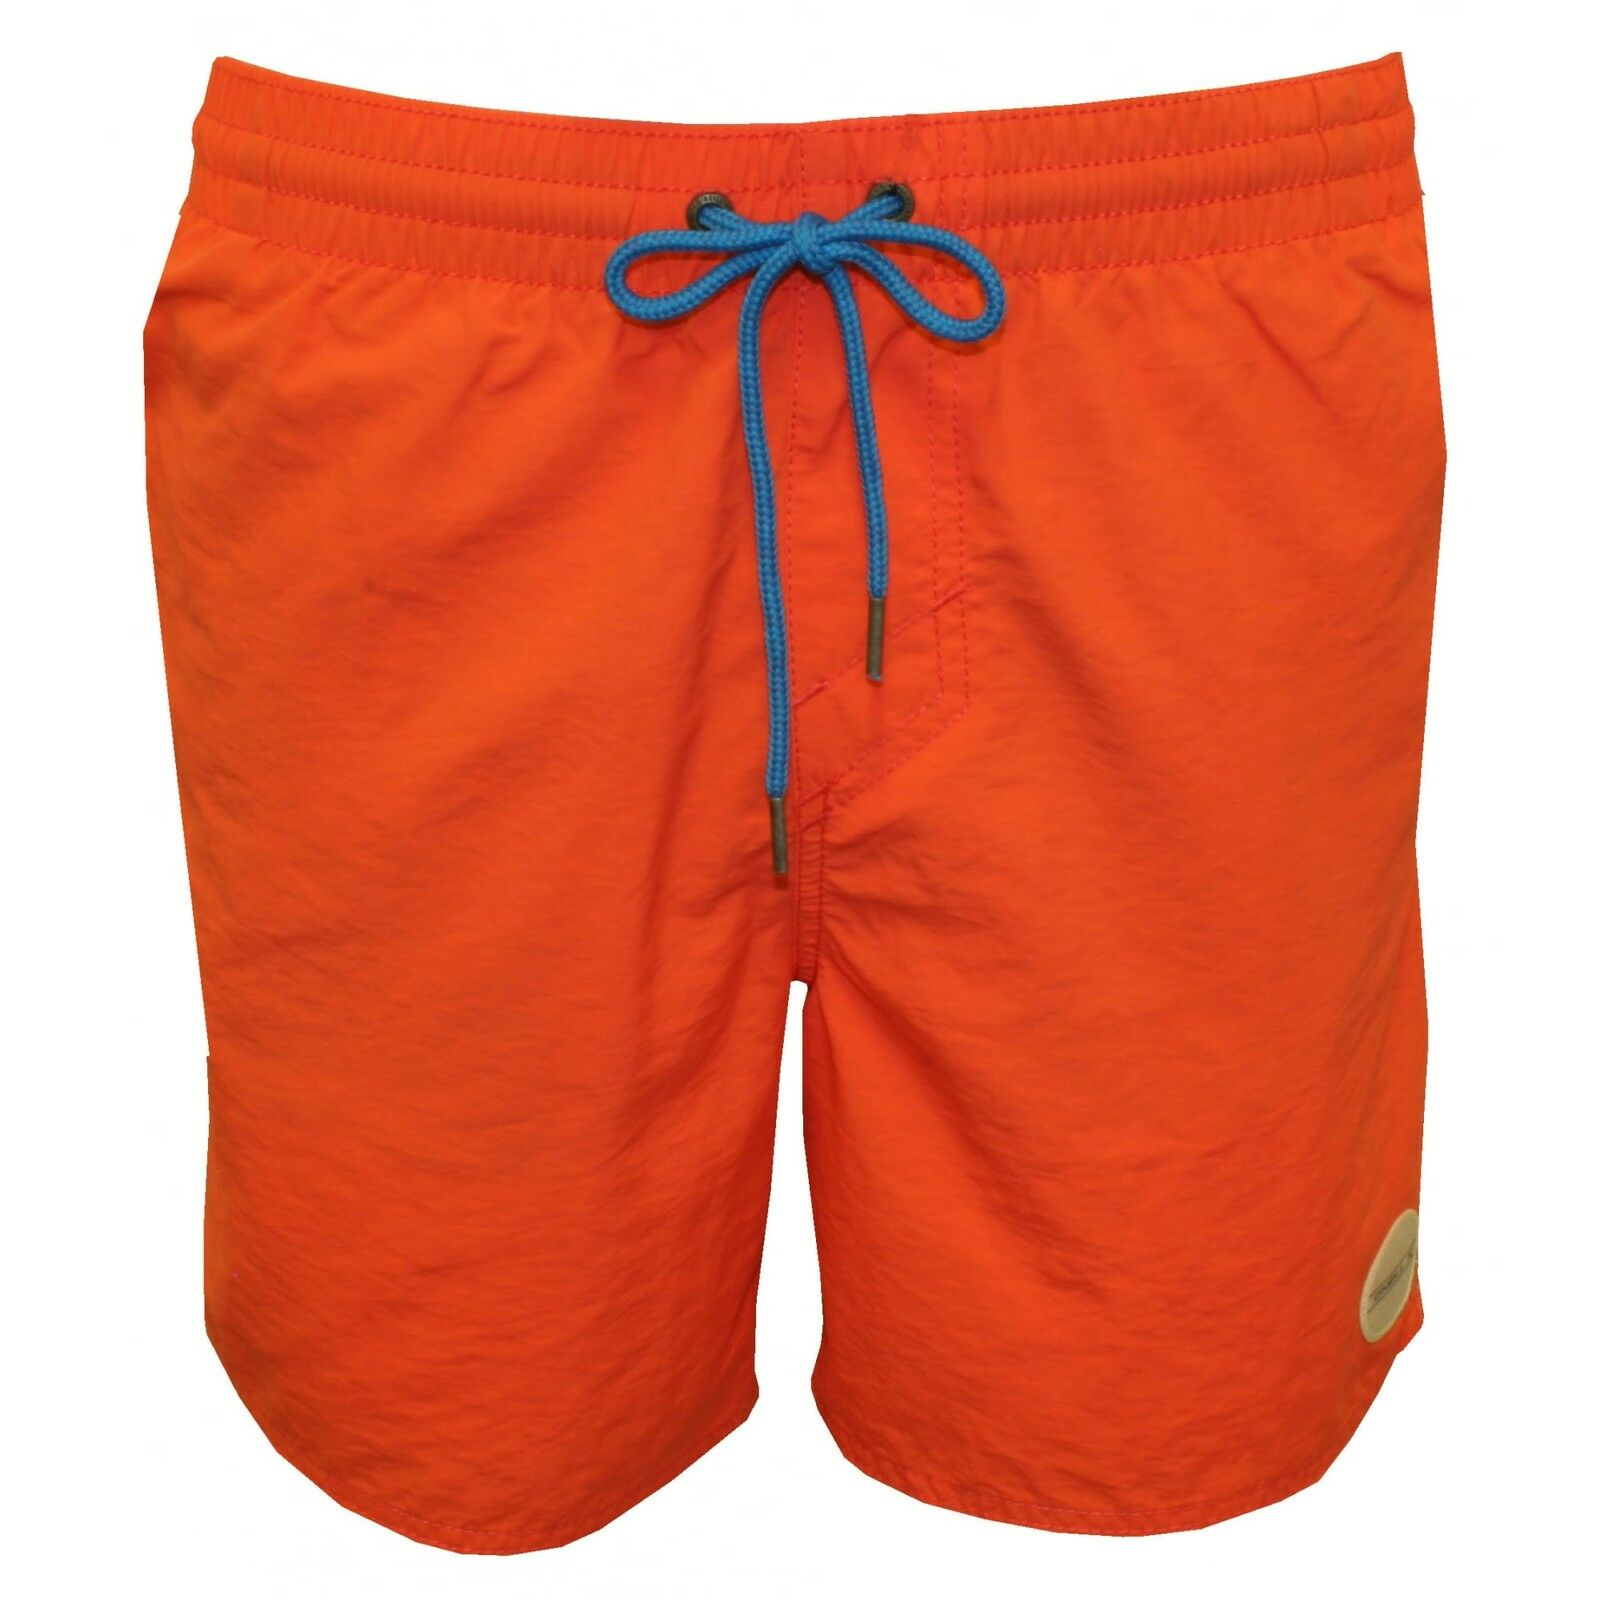 O'Neill green Solid Colour Men's Swim Shorts, Deep Sea Coral